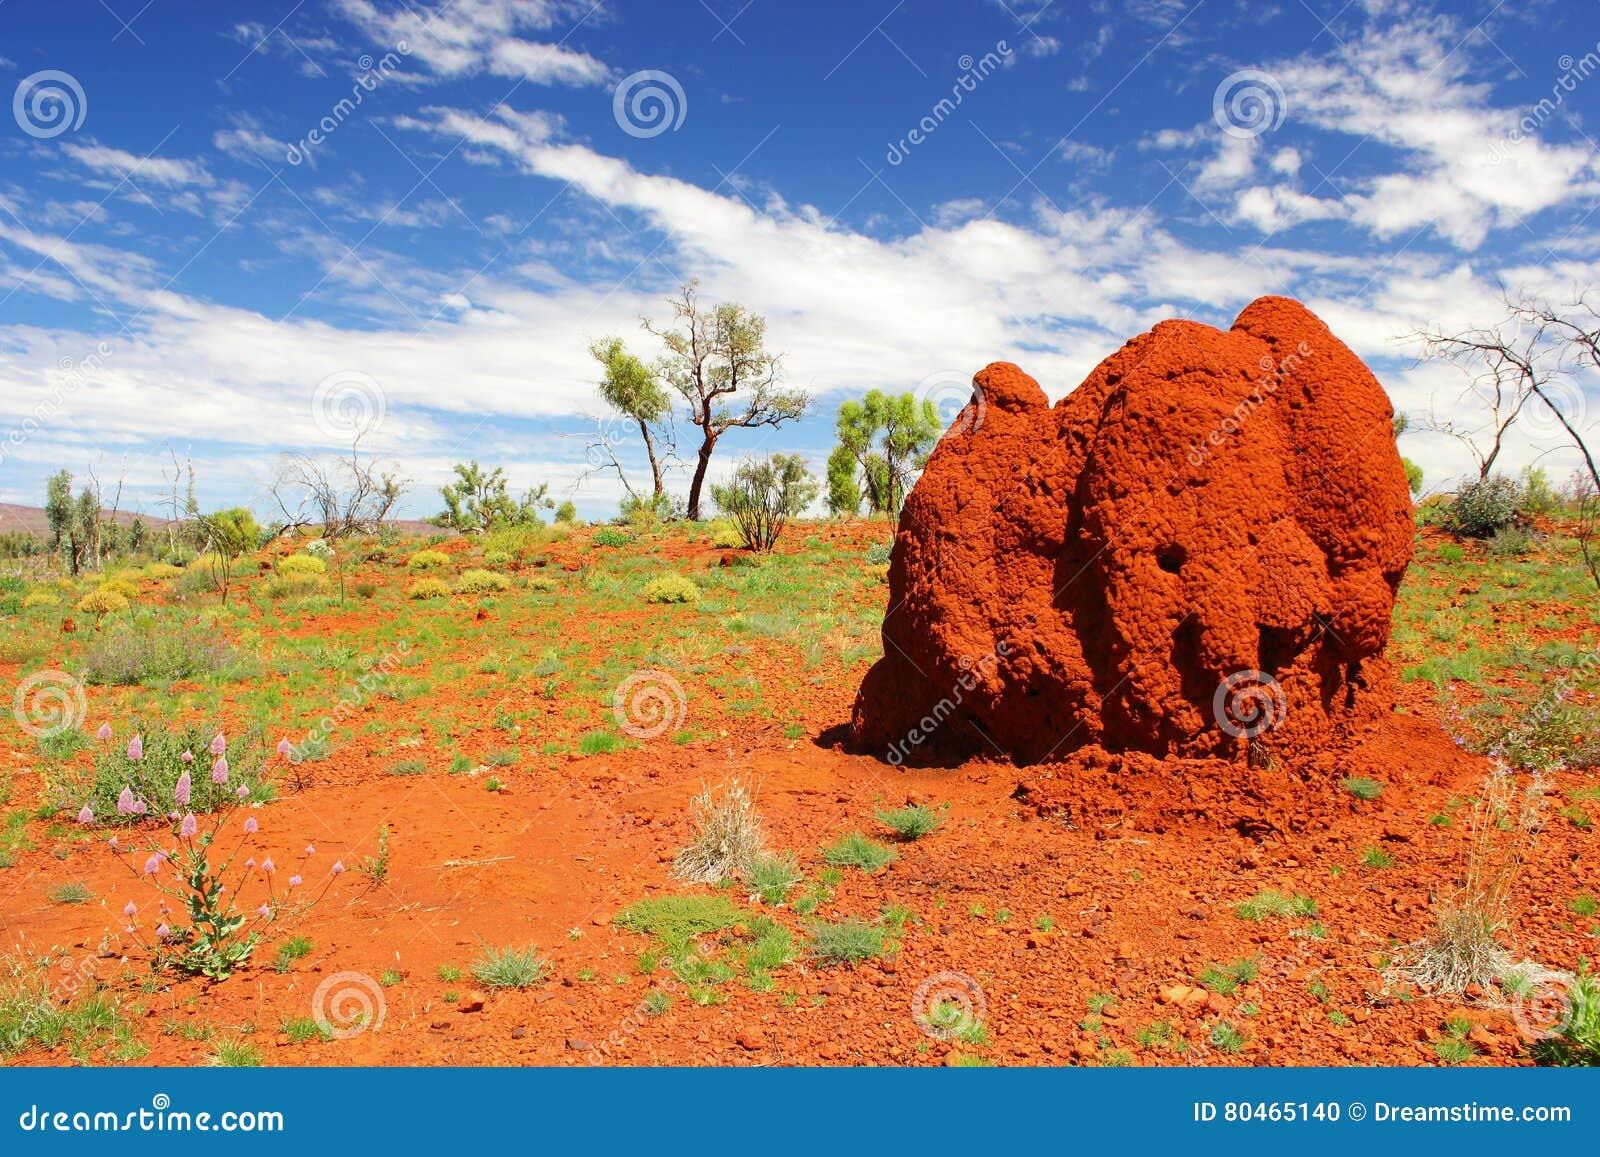 Massive Termite Mound In Australian Outback Western Australia Stock Photo Image Of Impressive Insect 80465140